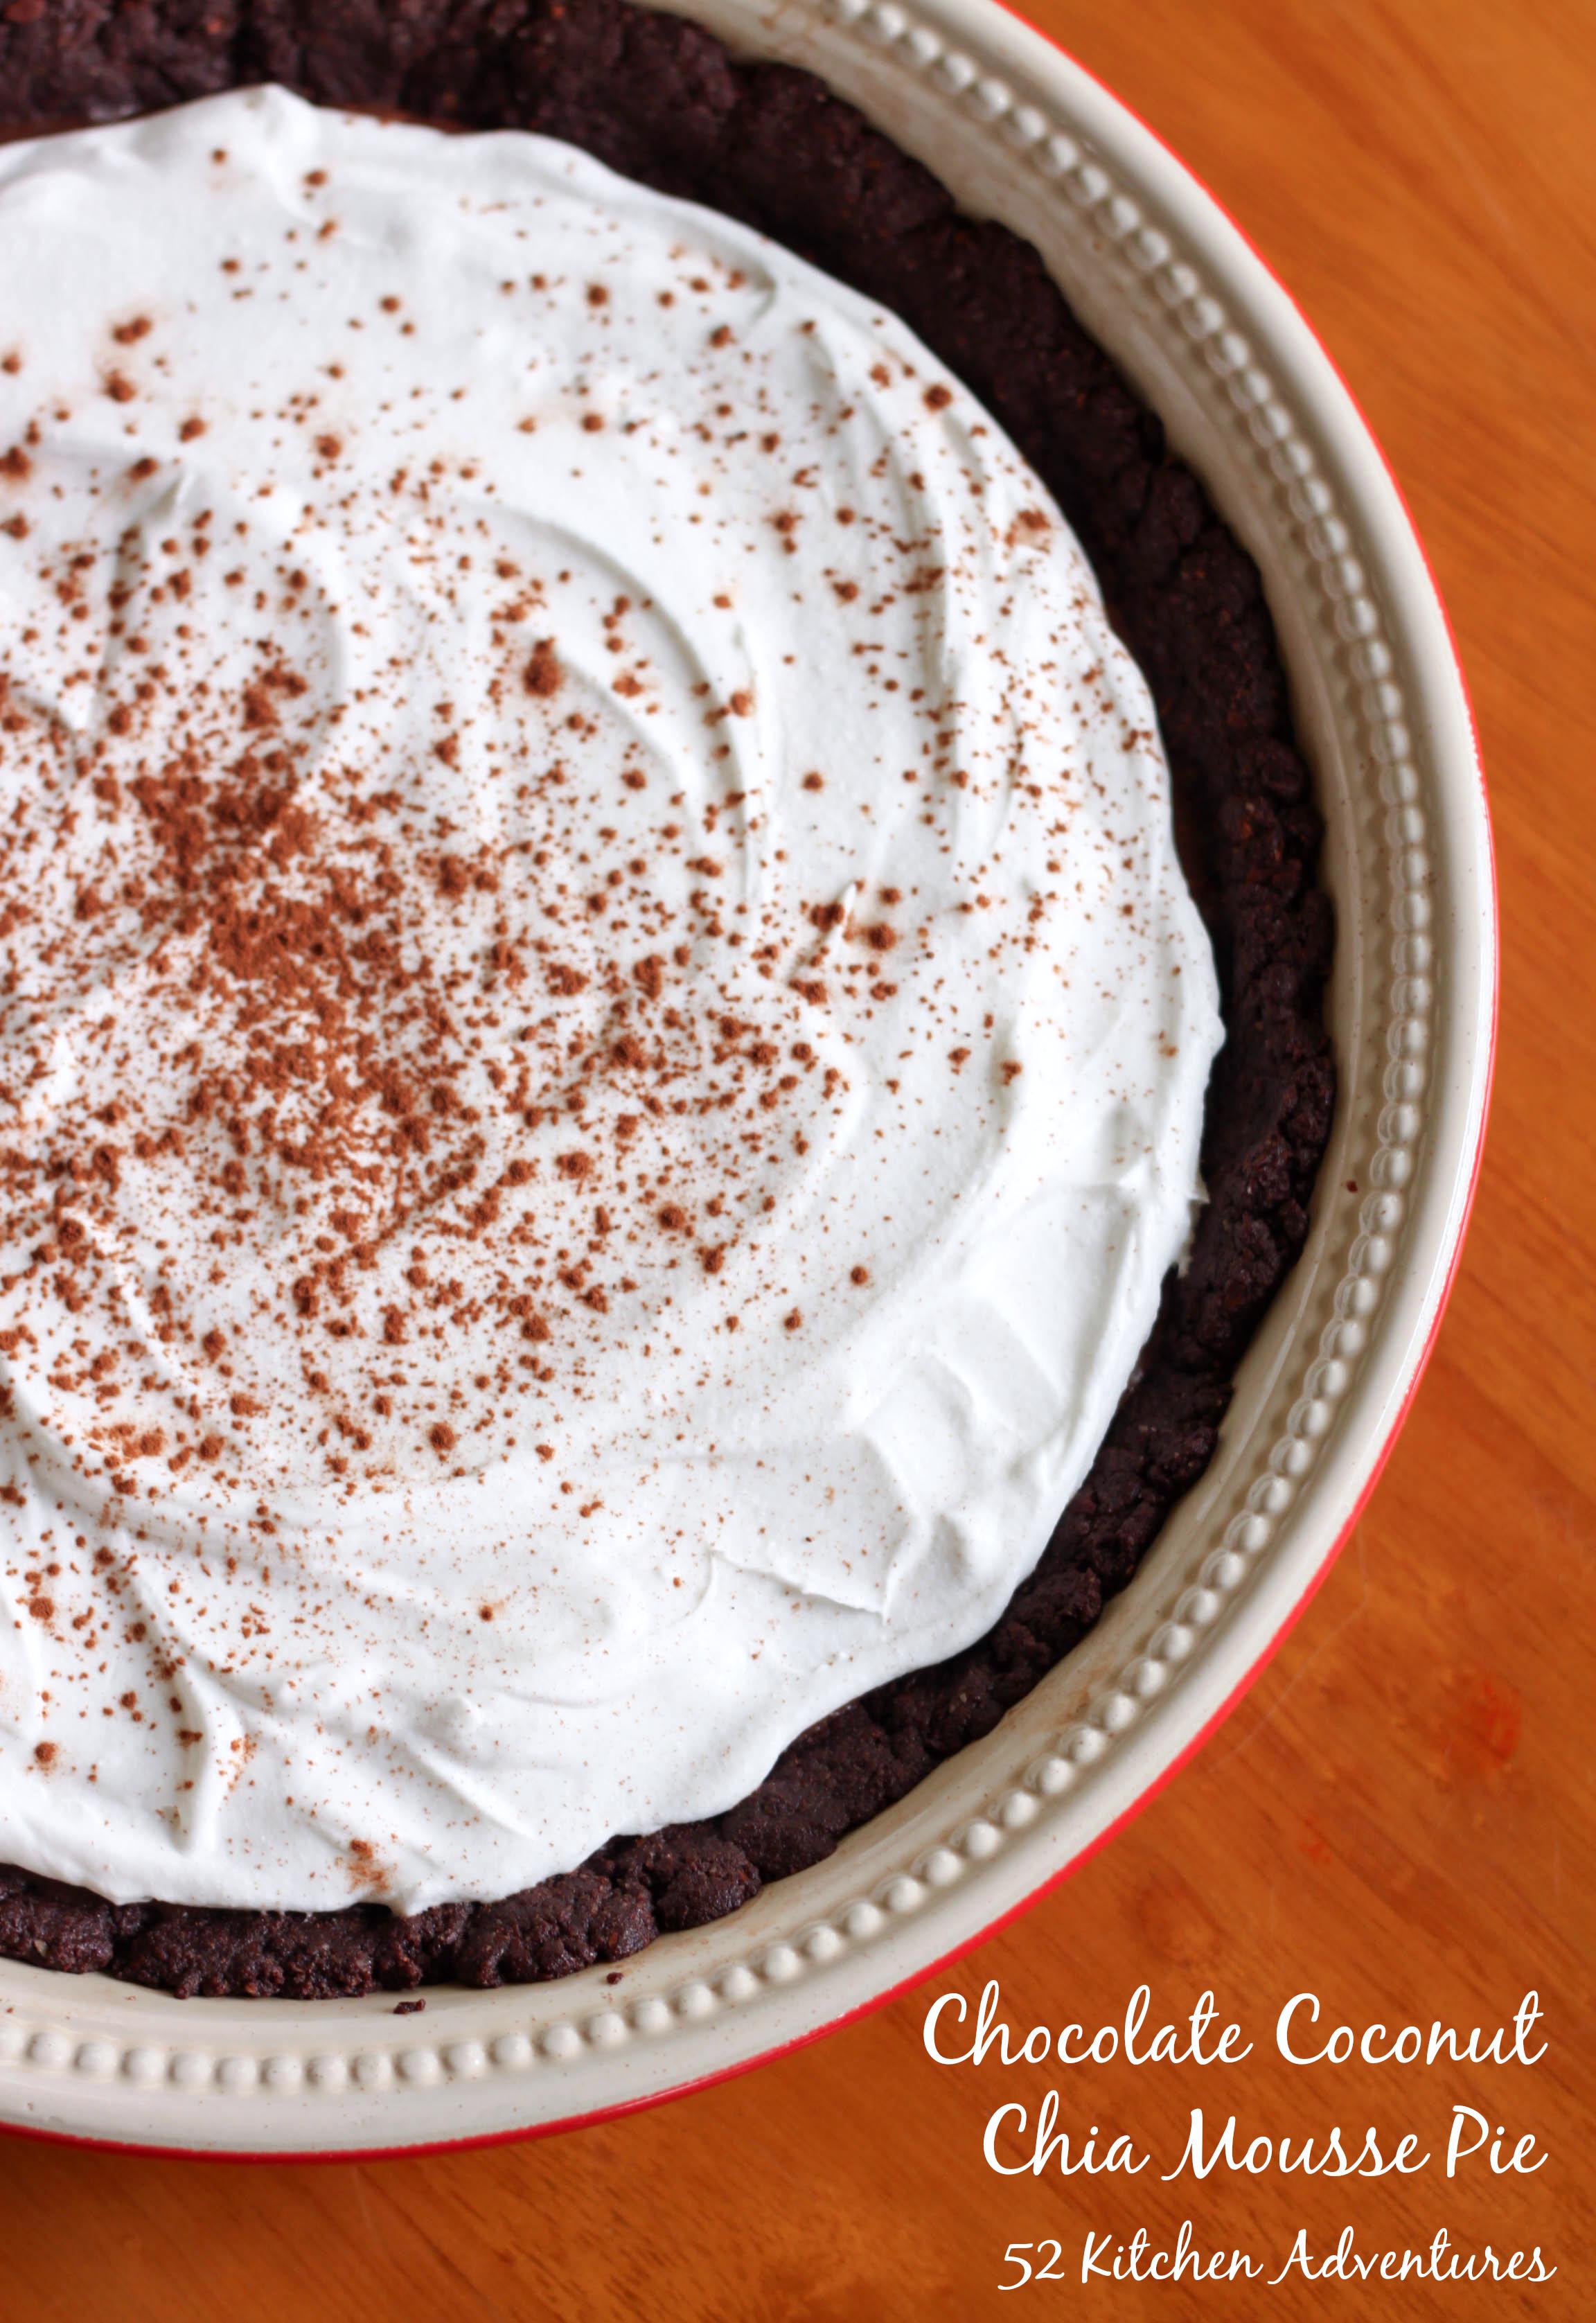 Chocolate Coconut Chia Mousse Pie